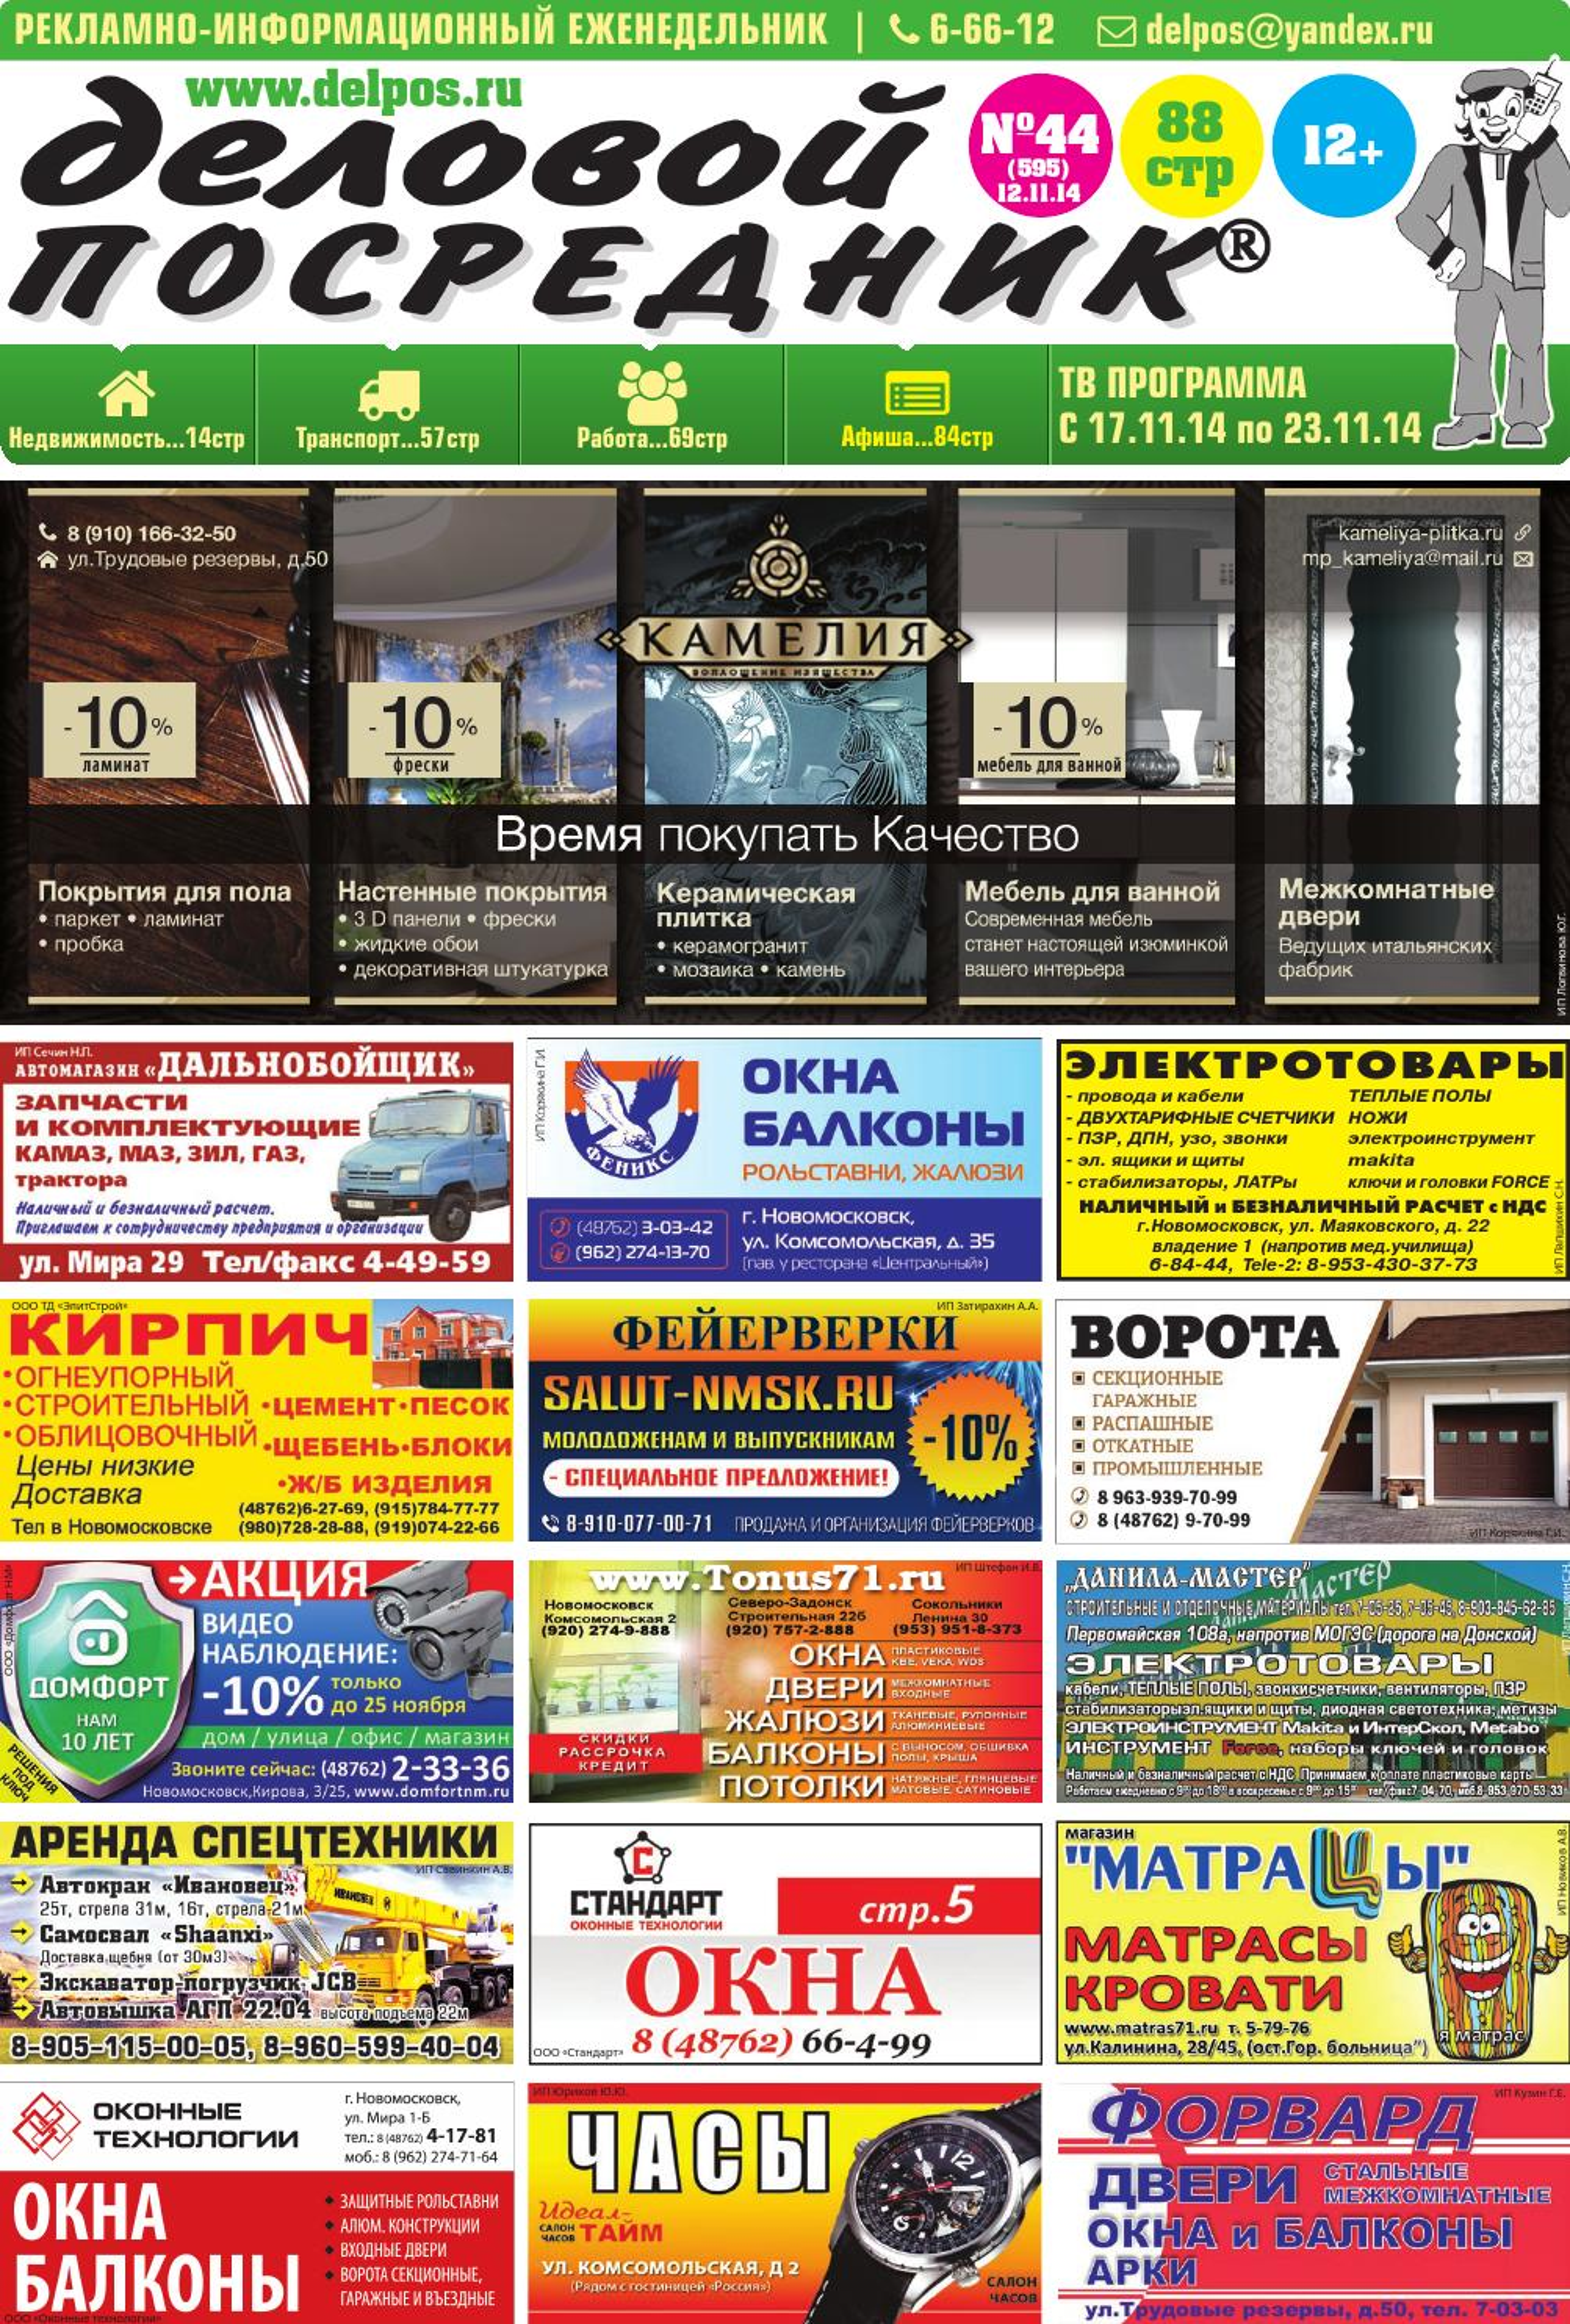 Деловой посредник № 44 by Rustam Abdullayev - issuu